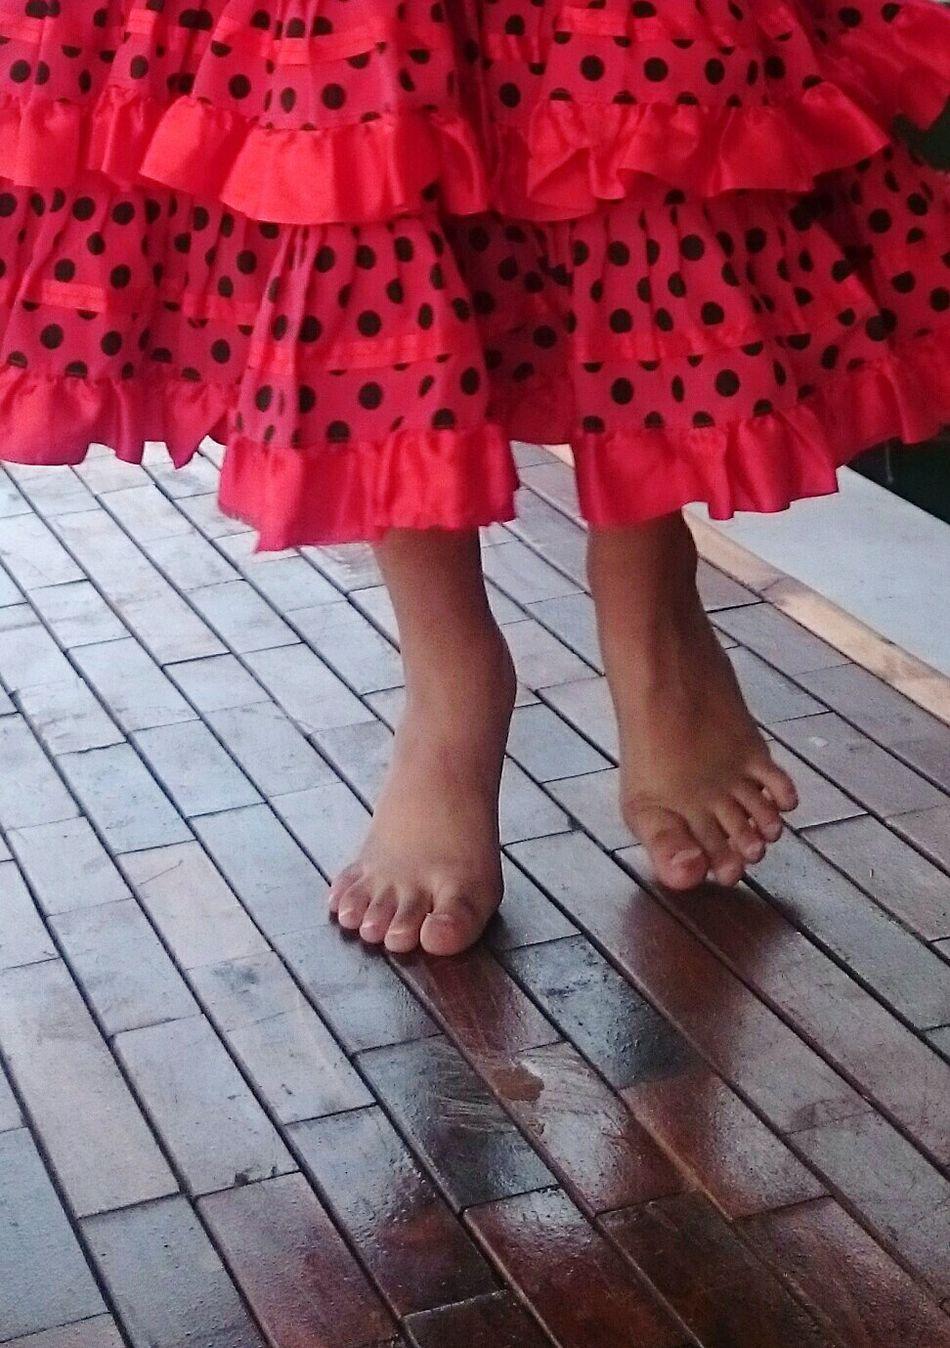 Human Leg Barefoot Human Foot Red Outdoors Street Photography Child Dancing Flaminco Girl